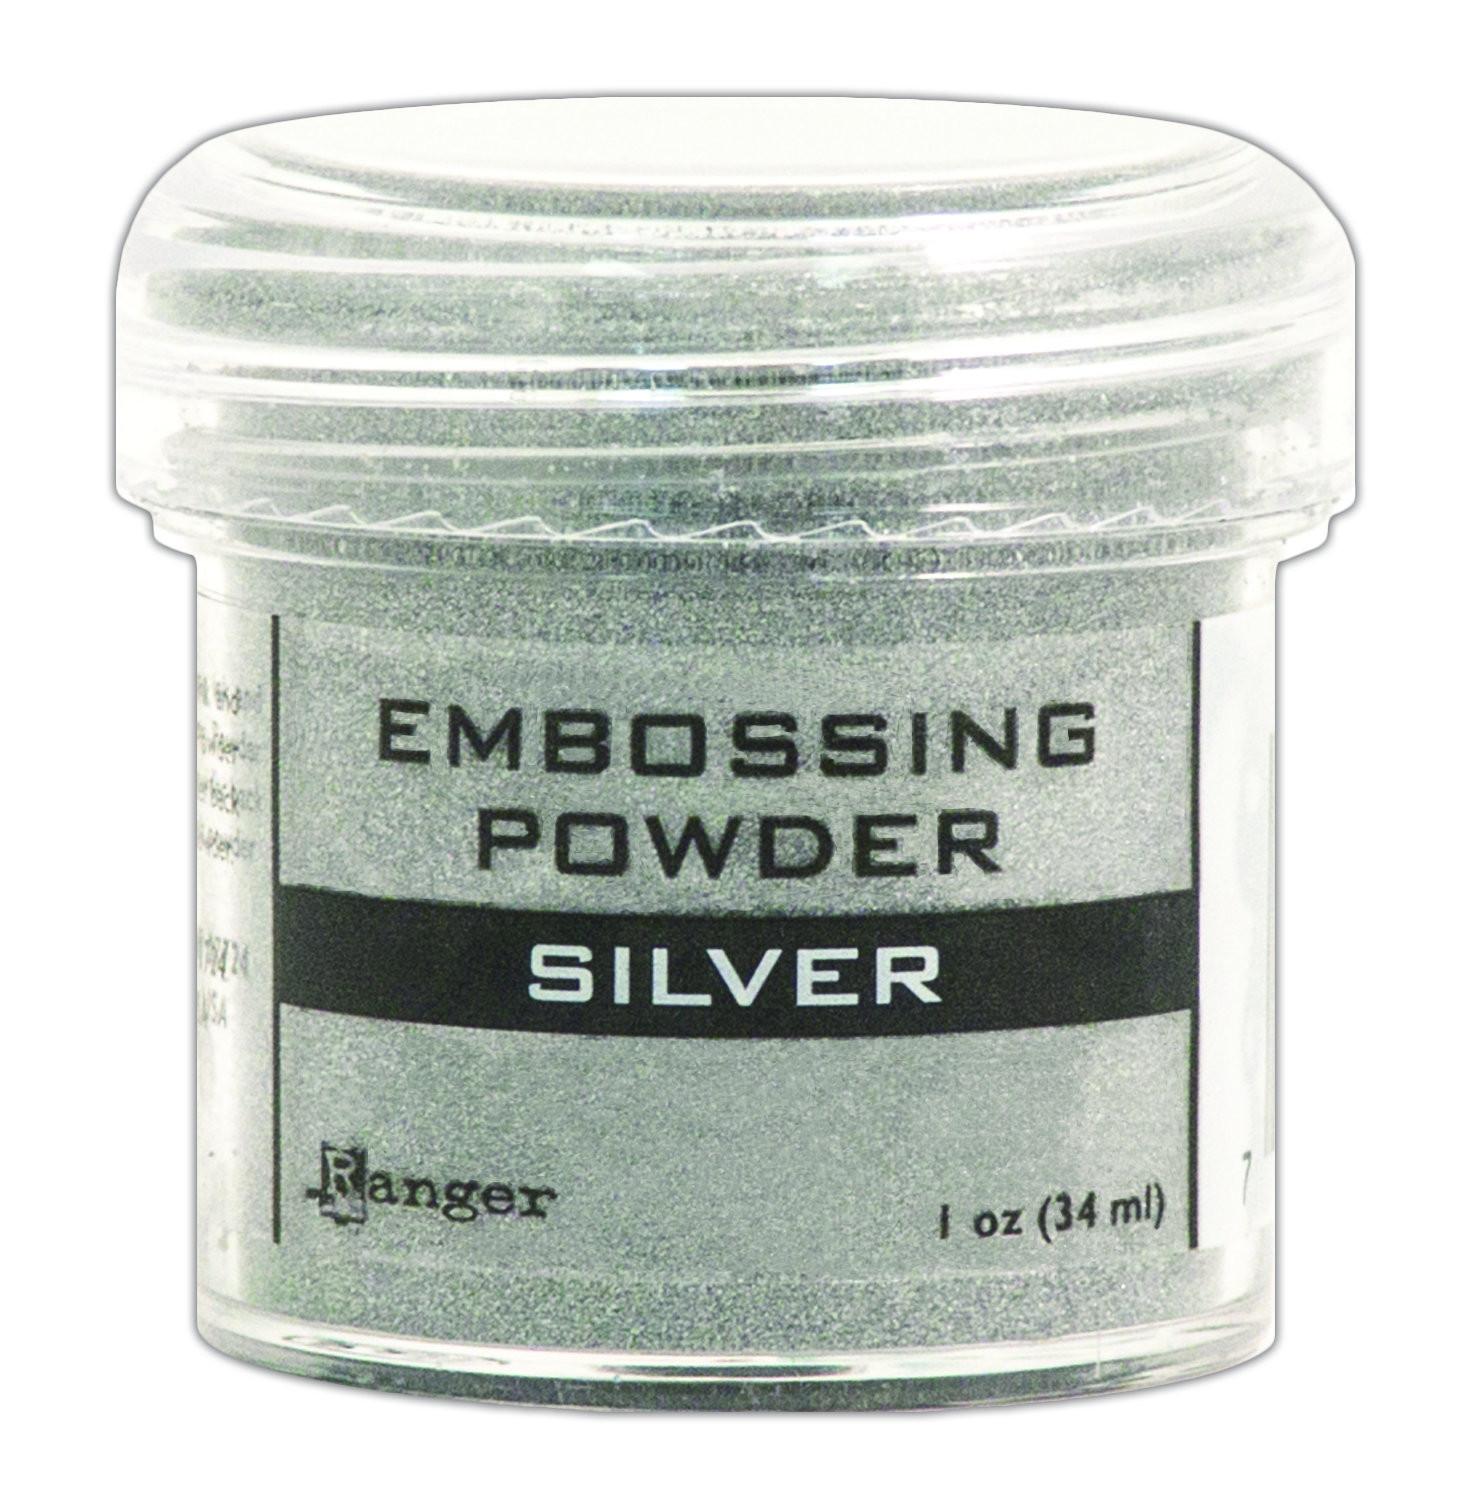 Ranger SILVER Embossing Powder 1oz